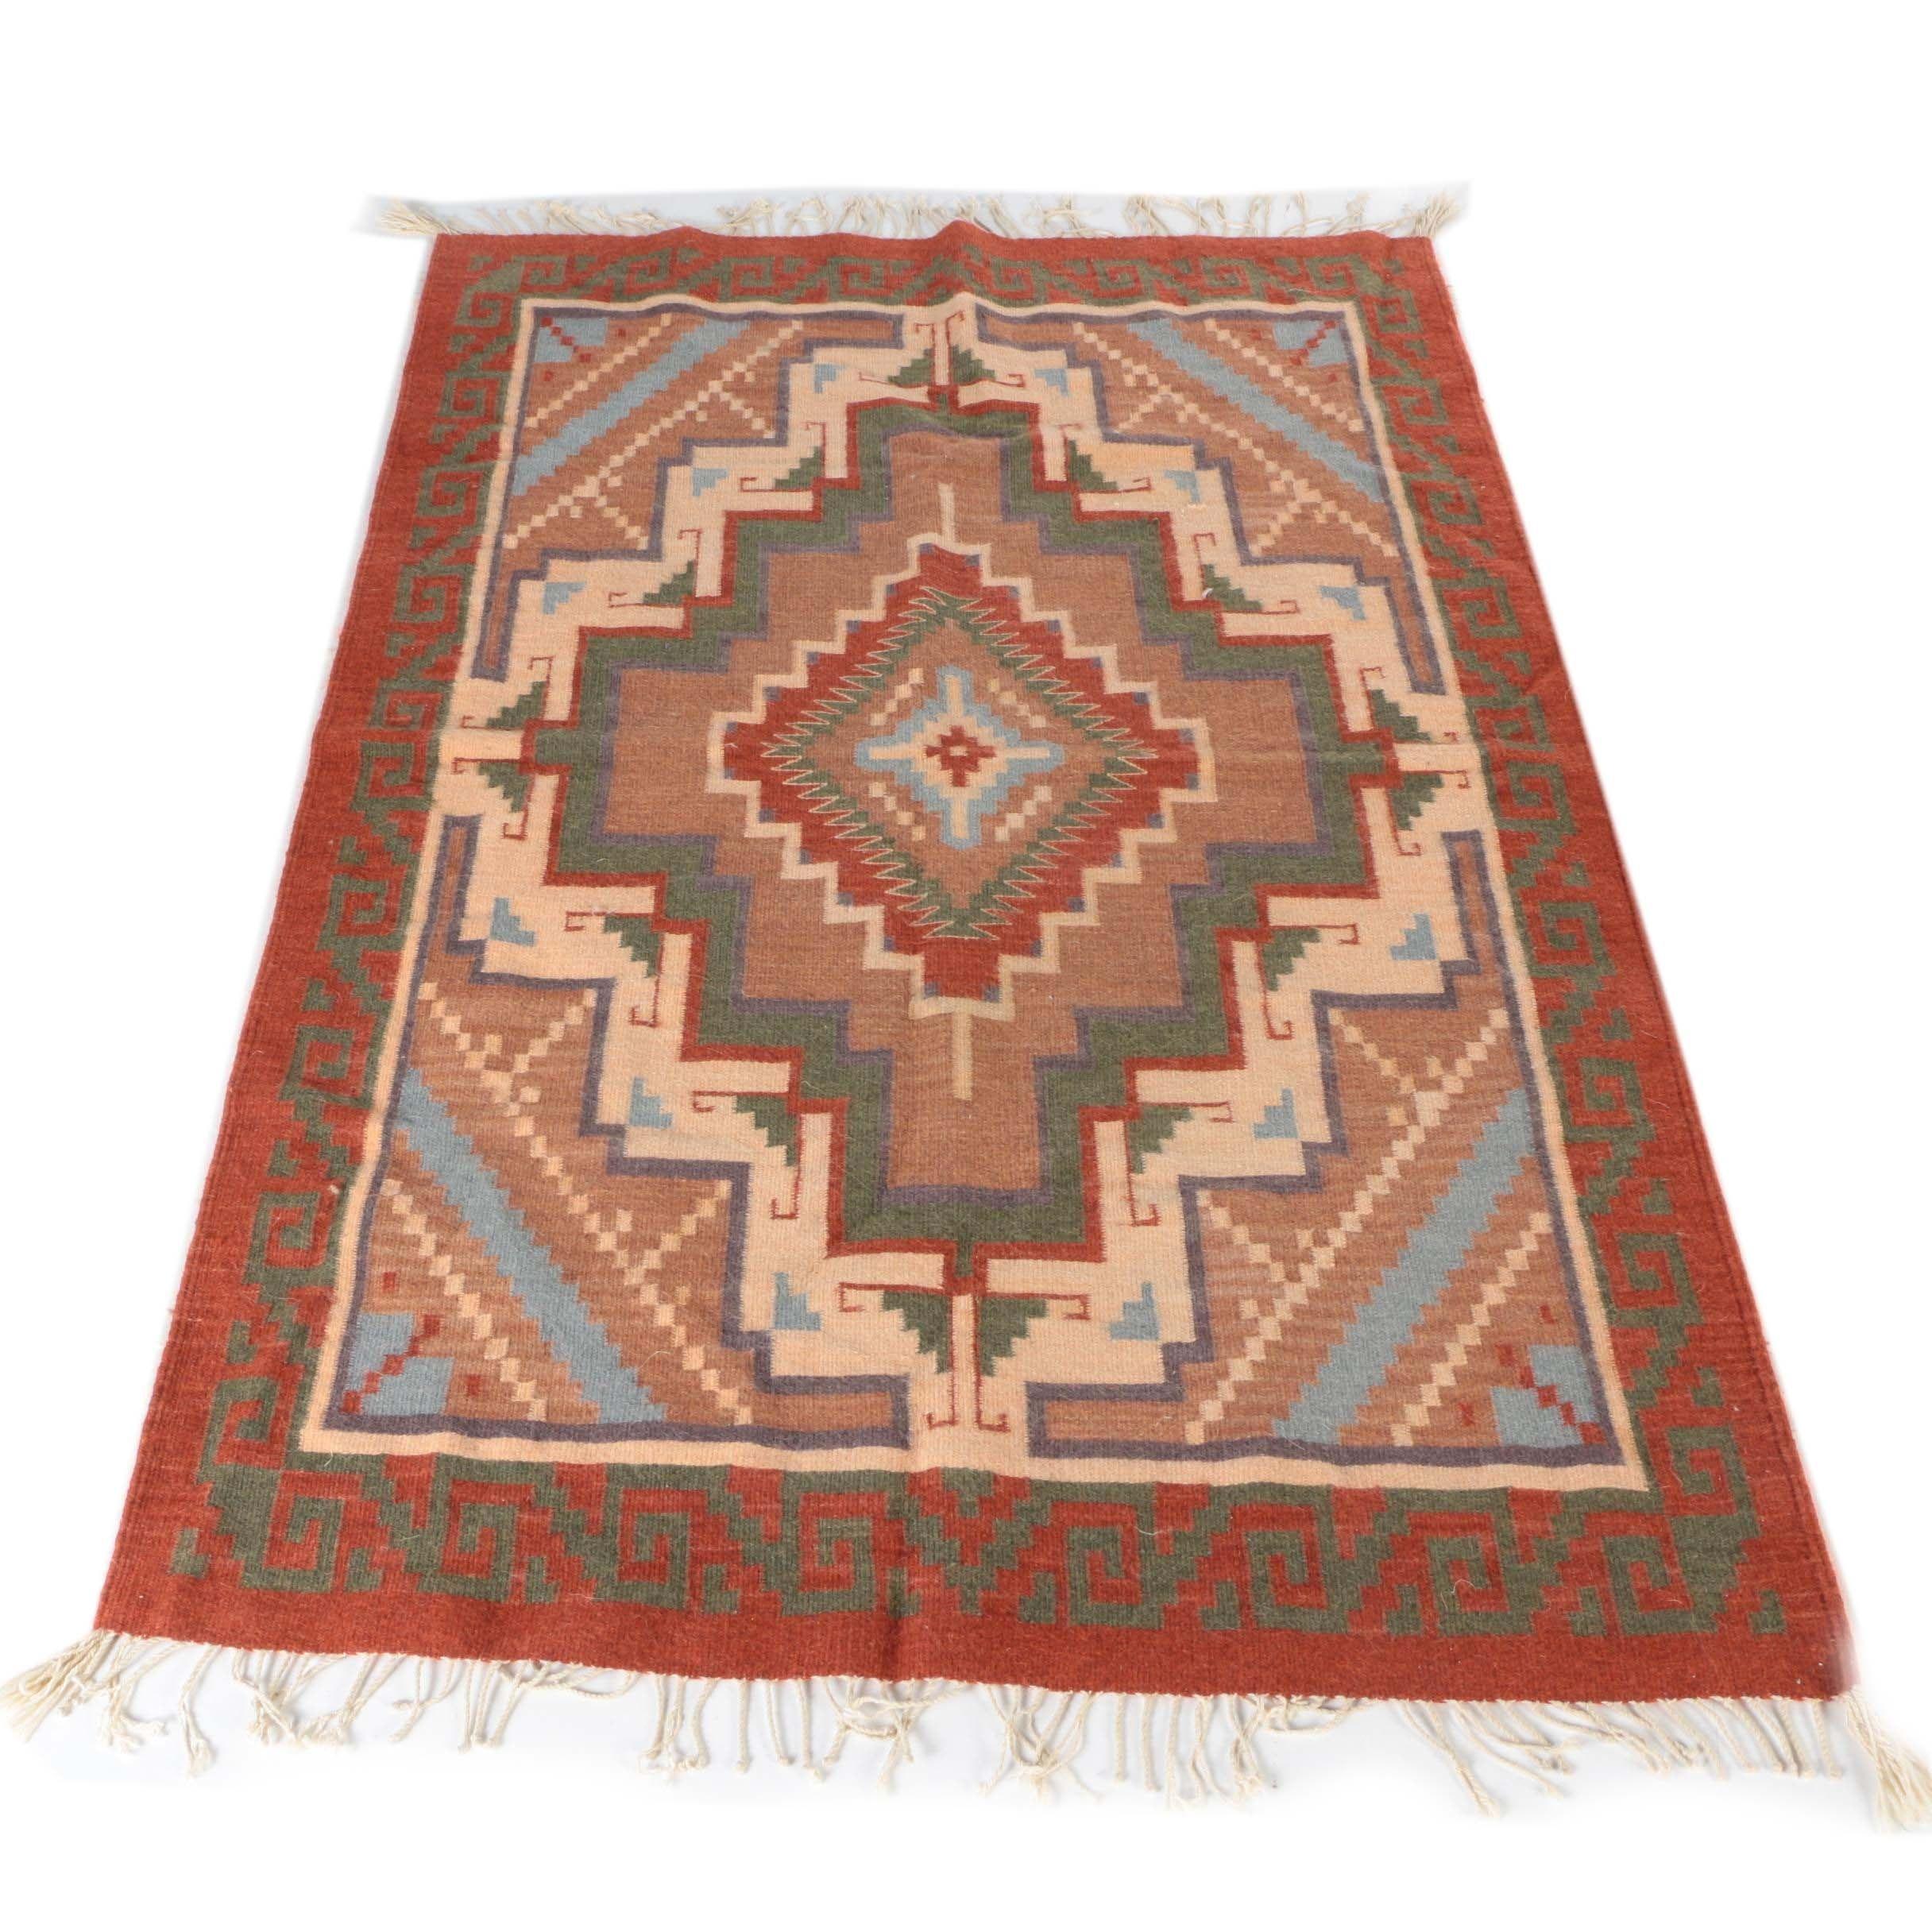 Flatweave Handwoven Kilim Wool Area Rug